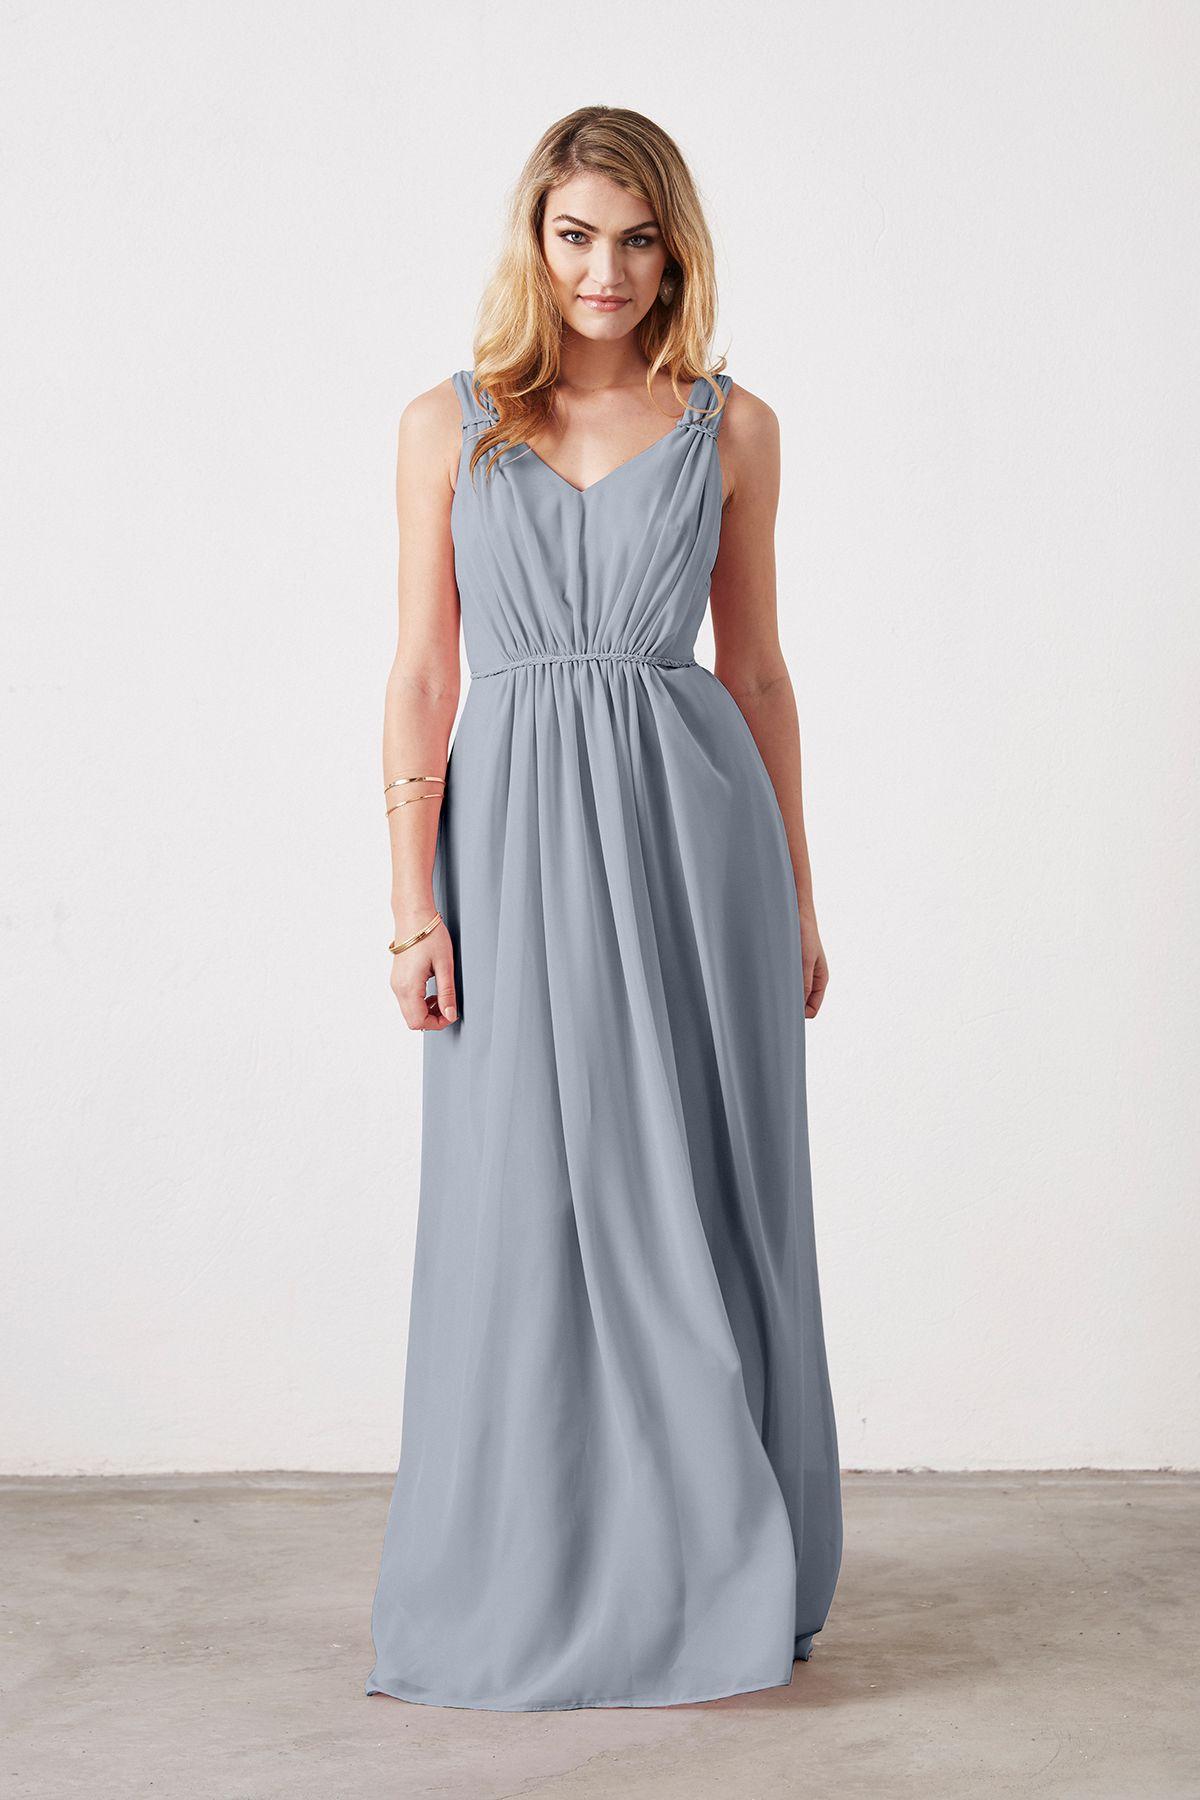 e6bcf0418a4 Weddington Way Juliette Bridesmaid Dress in Mystic in Chiffon ...